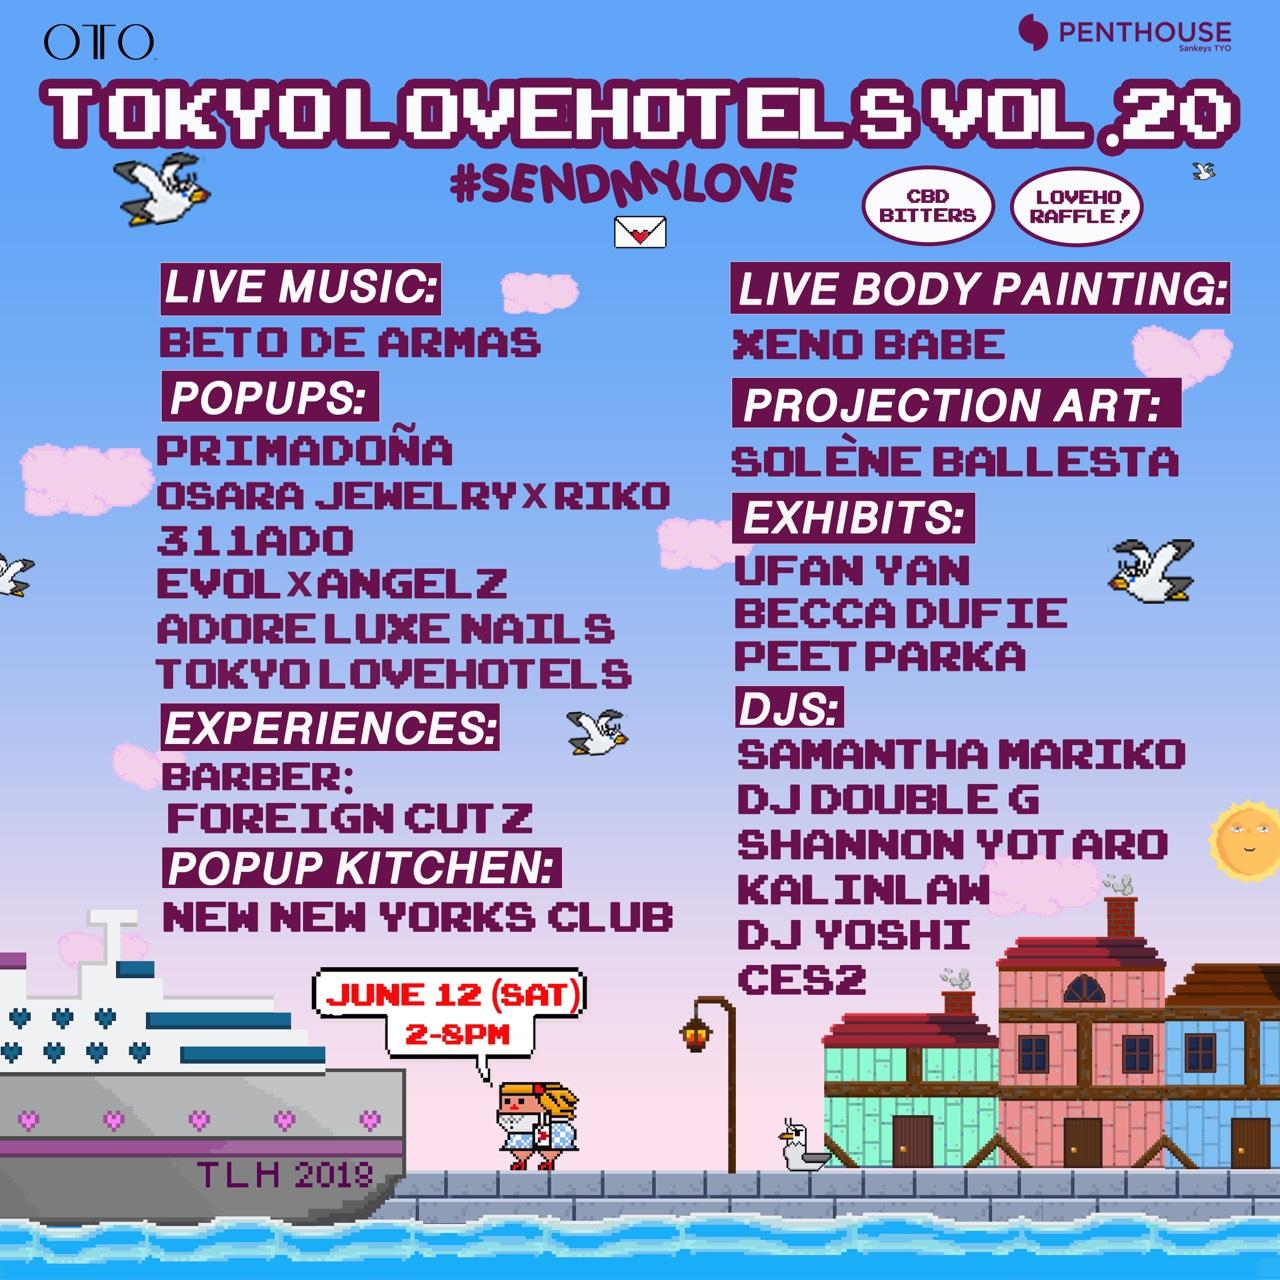 TOKYO LOVEHOTELS Vol.20 #SENDMYLOVE